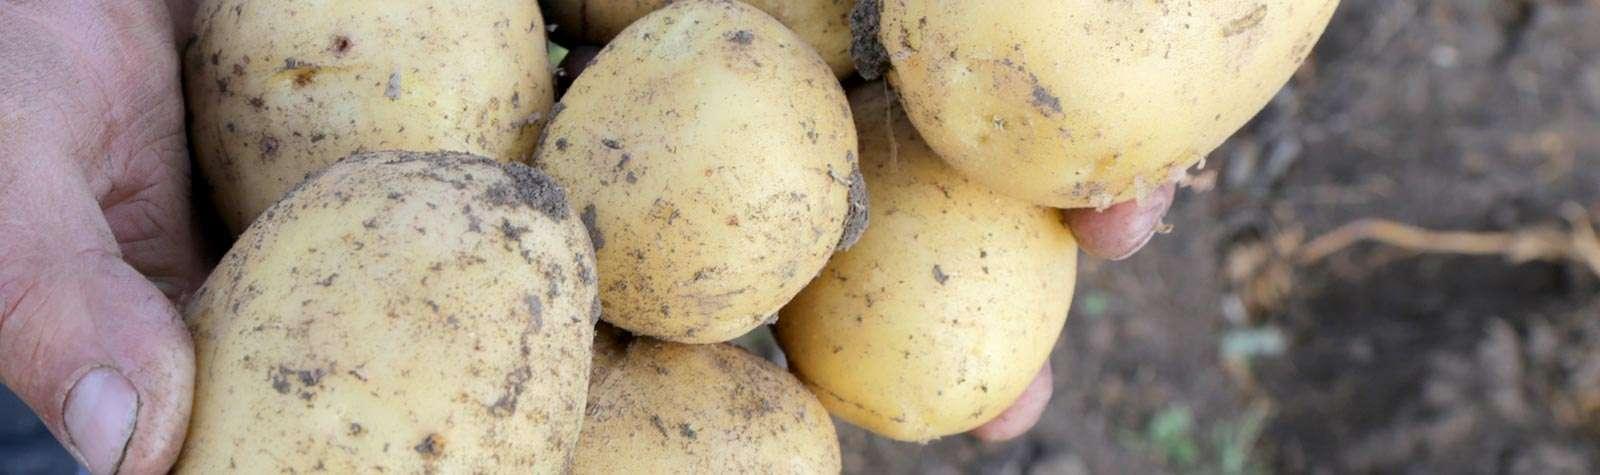 Fortunes Potatoes